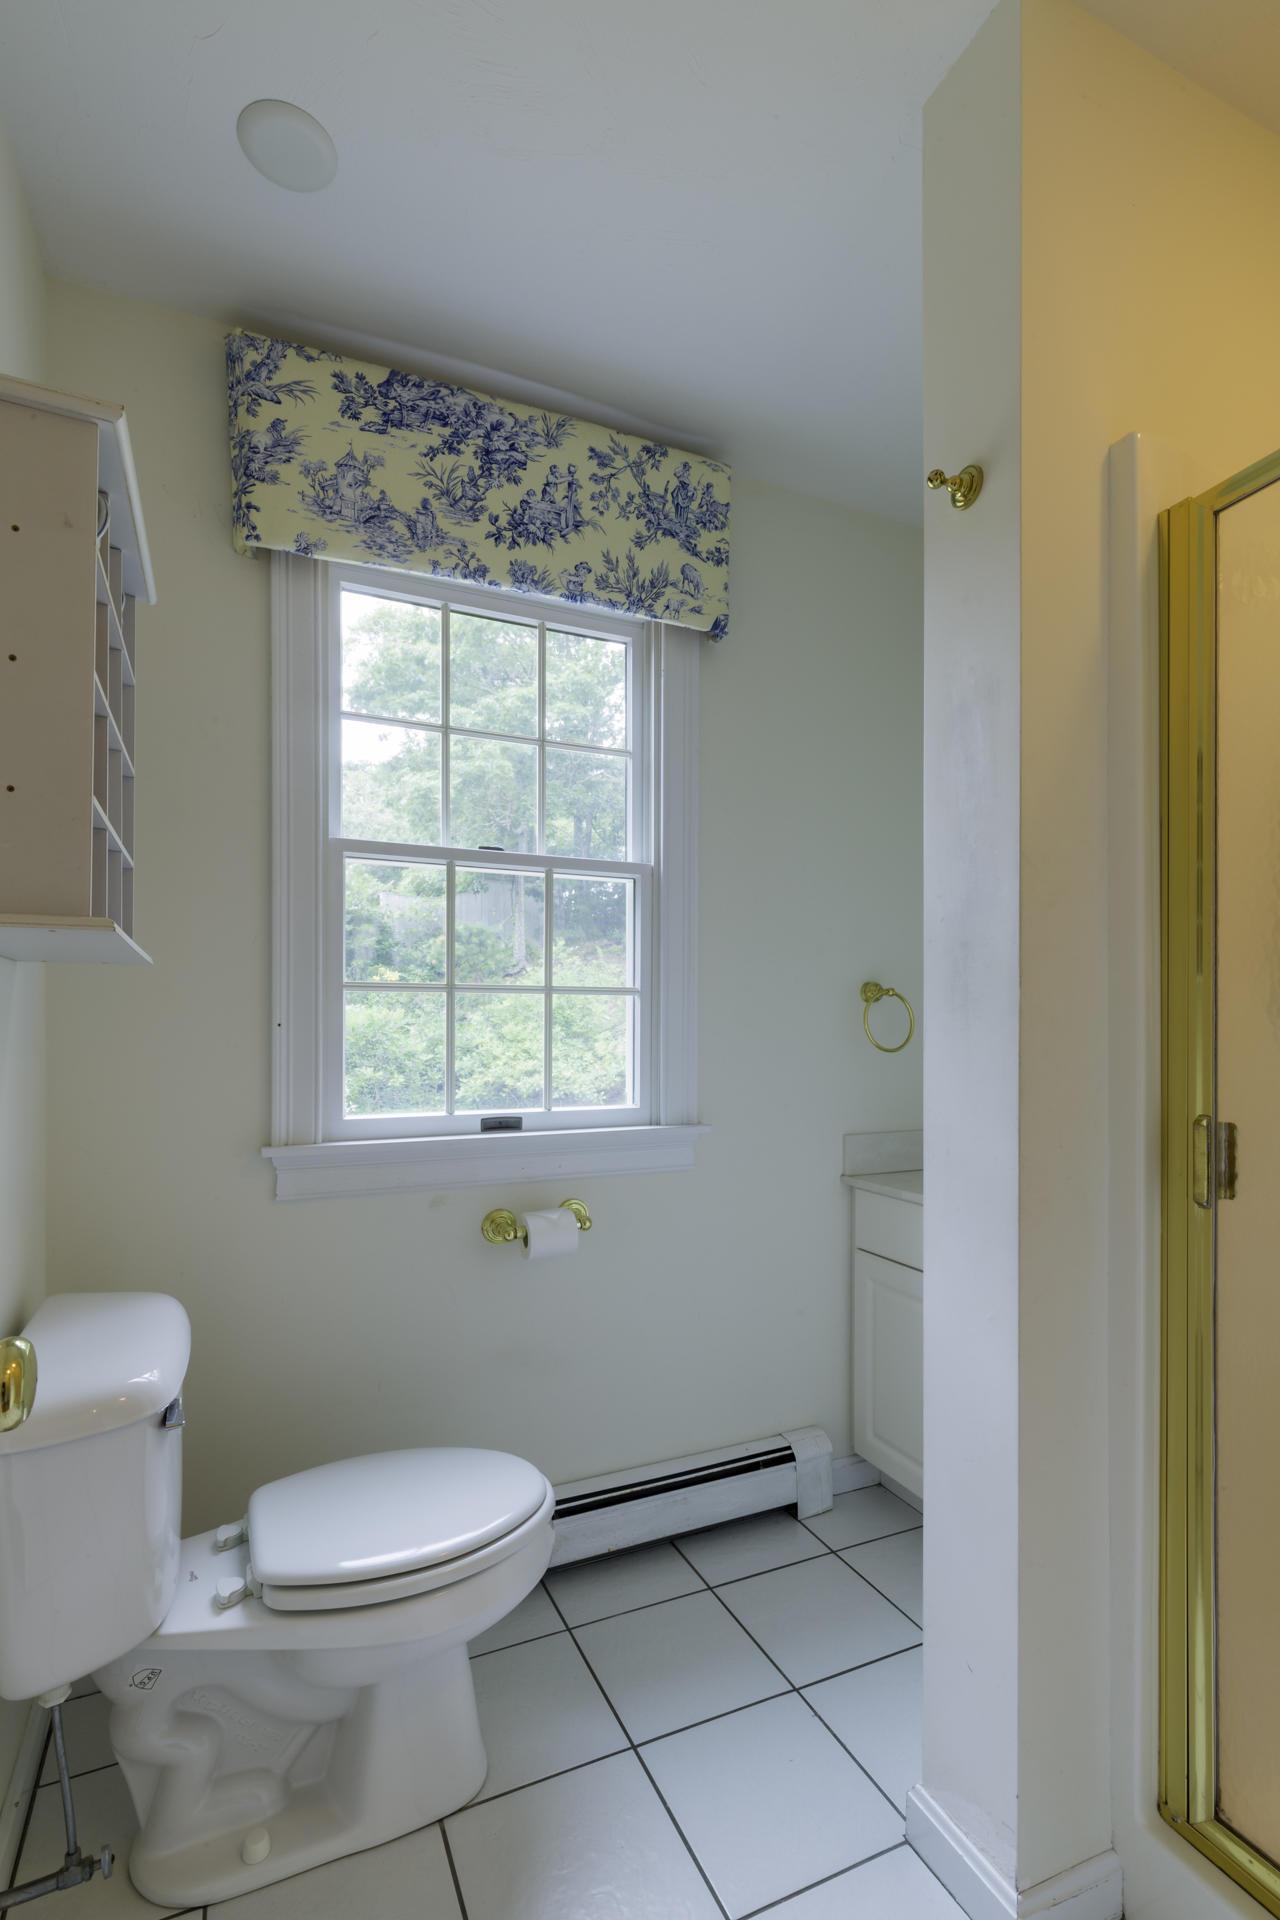 39 Shady Lane, Chatham MA, 02633 - slide 14